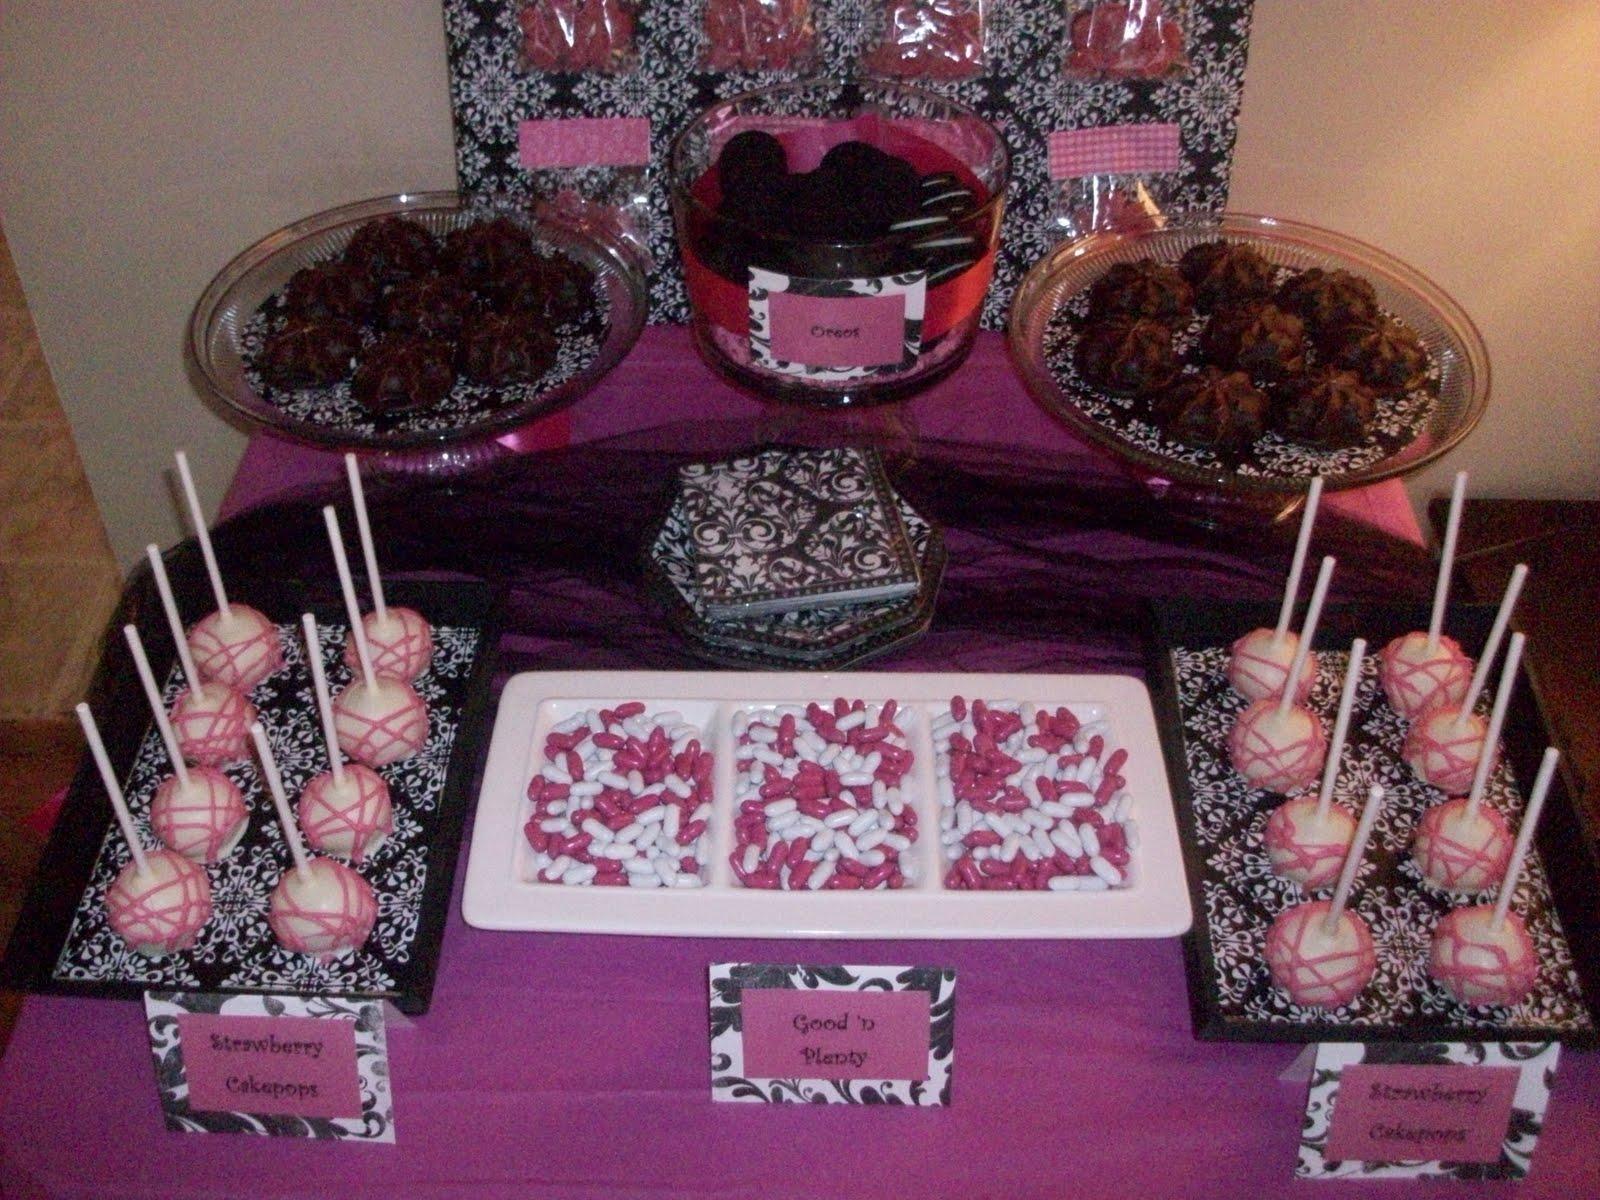 North Pole Treat Ideas - Christmas Party Ideas - Holiday ... |Sweet Treats Party Table